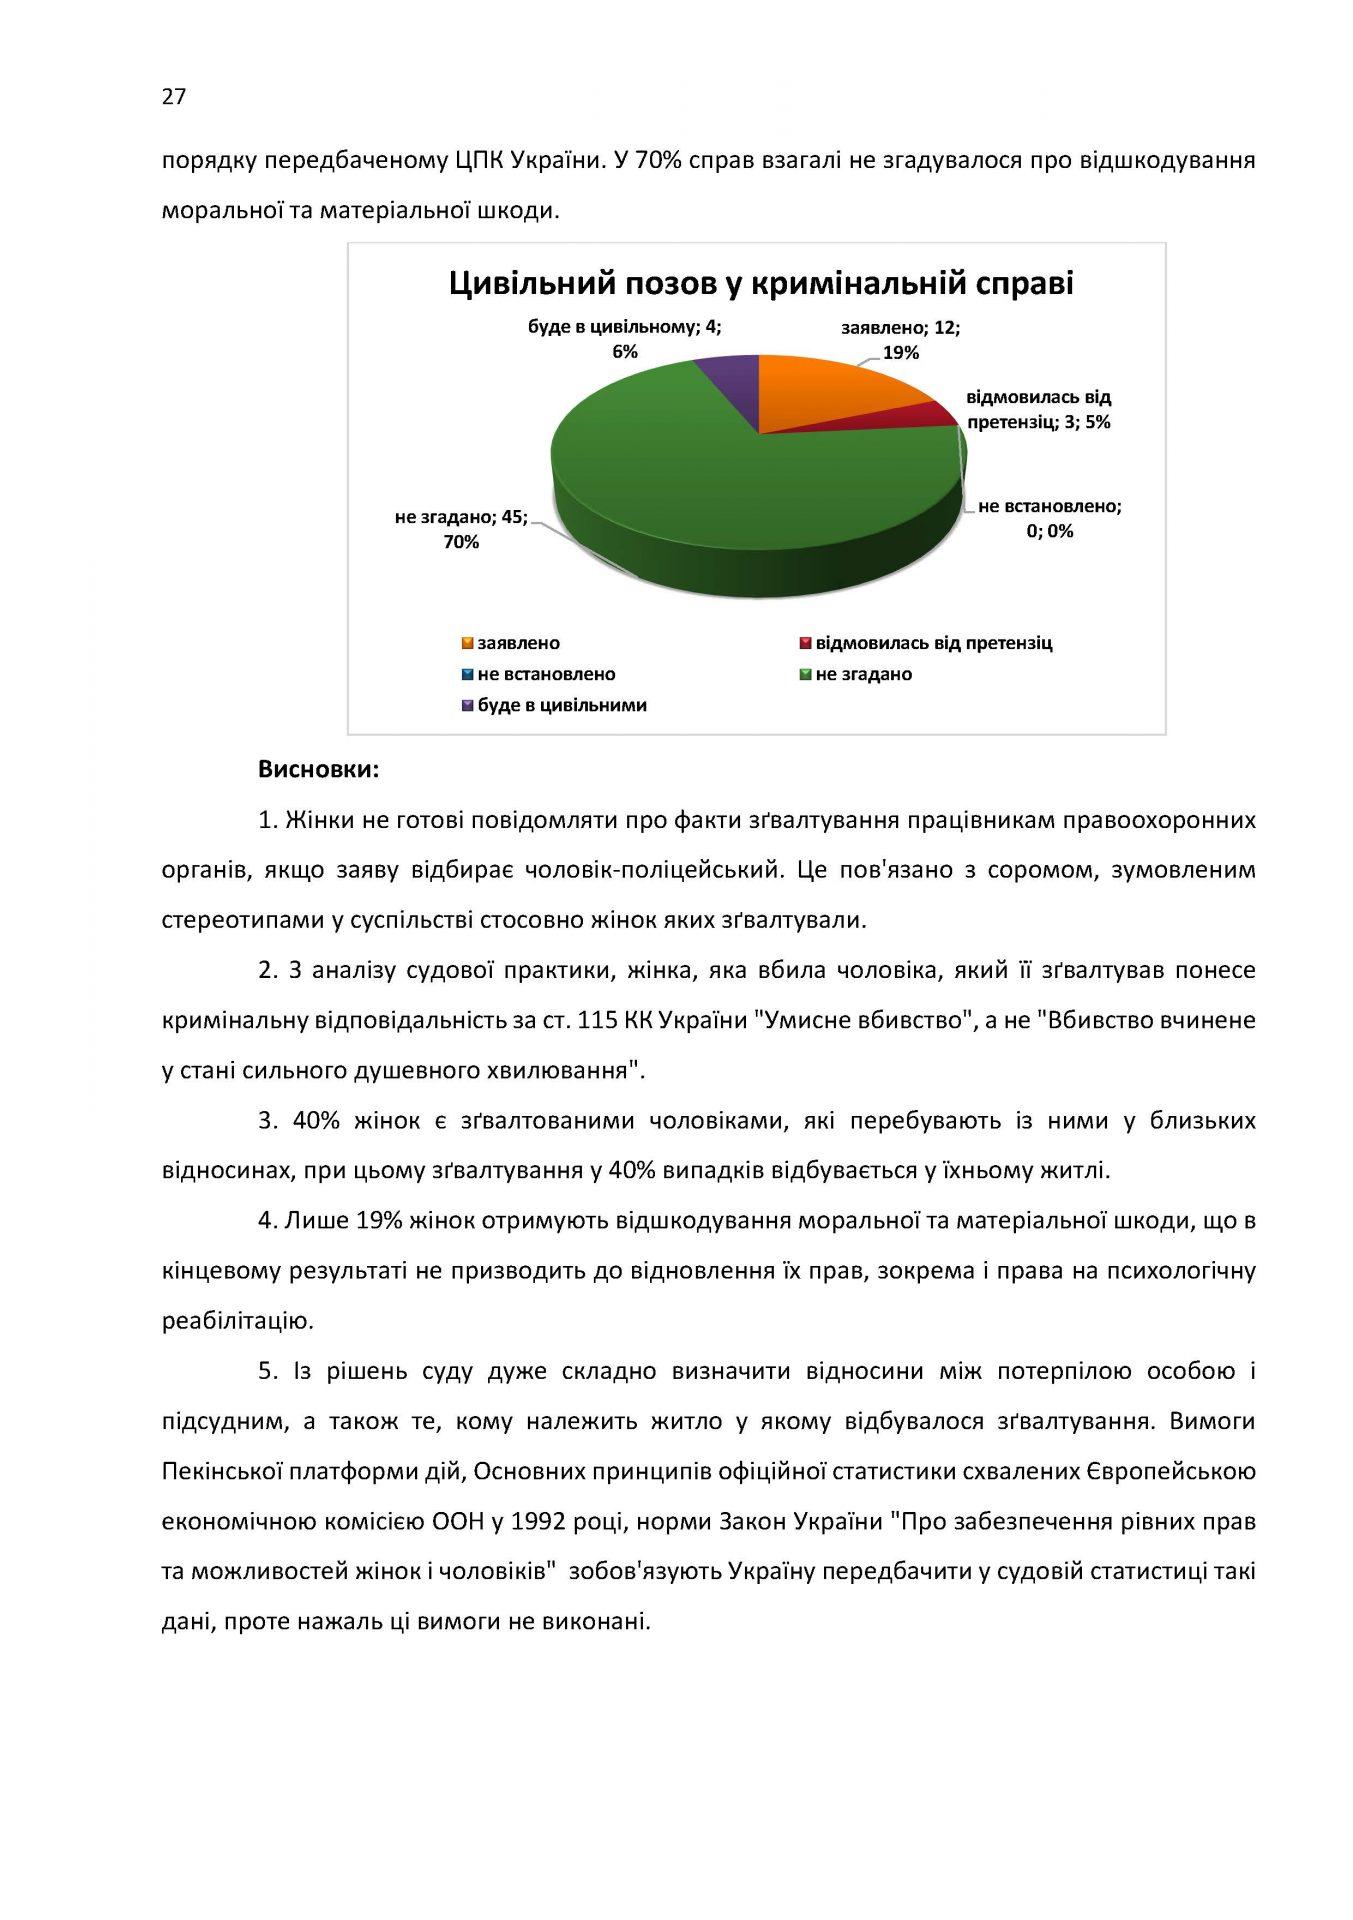 Draft Report monitoring print USAID_Страница_27